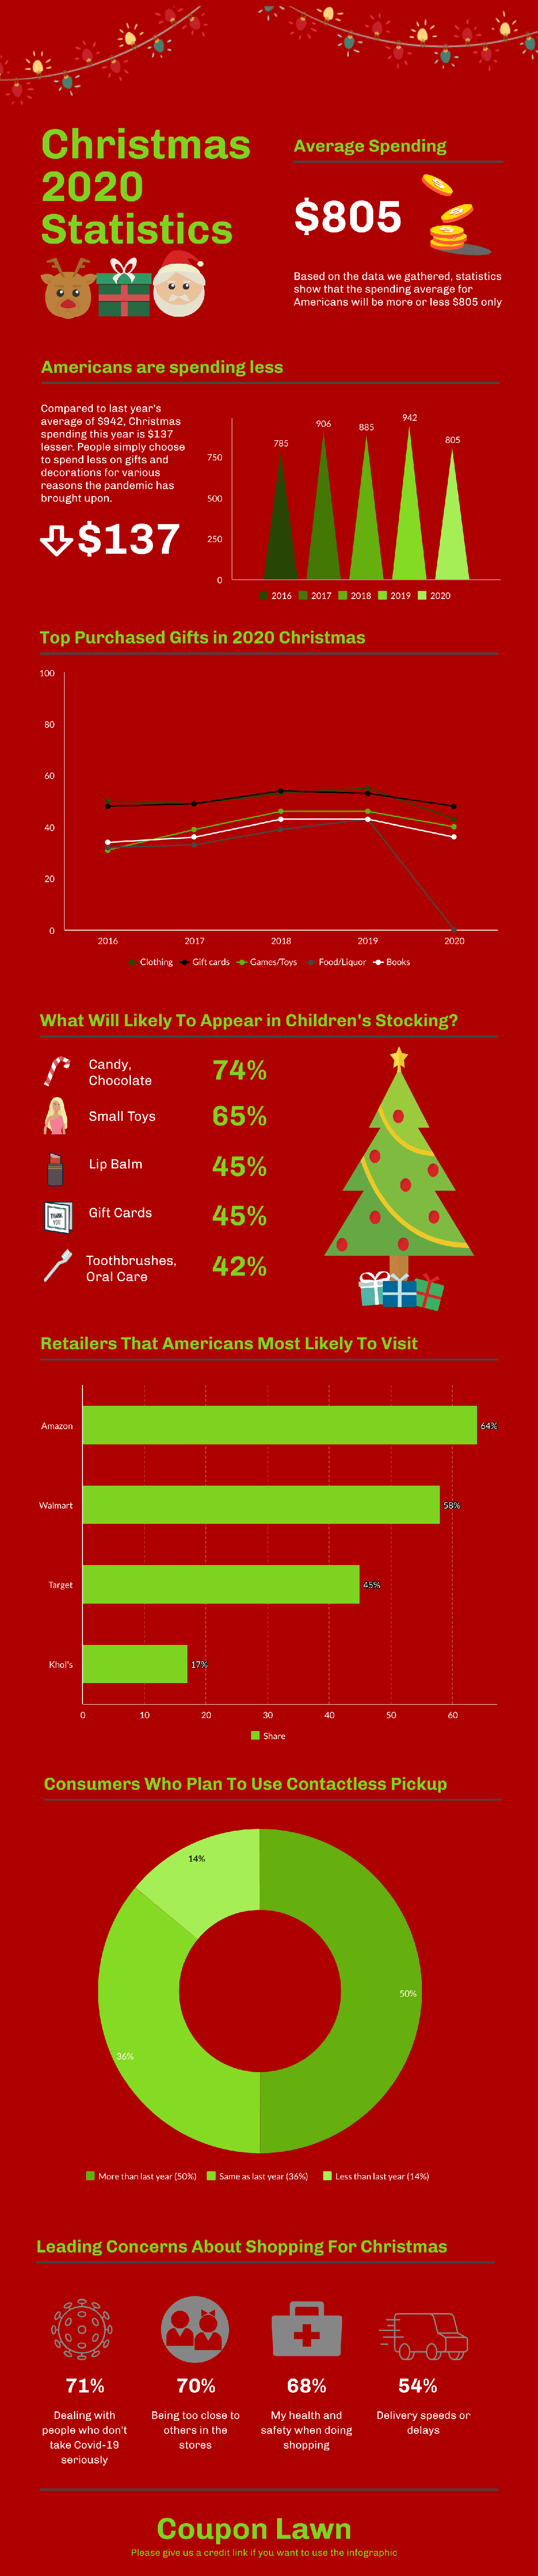 Christmas 2020 Statistics